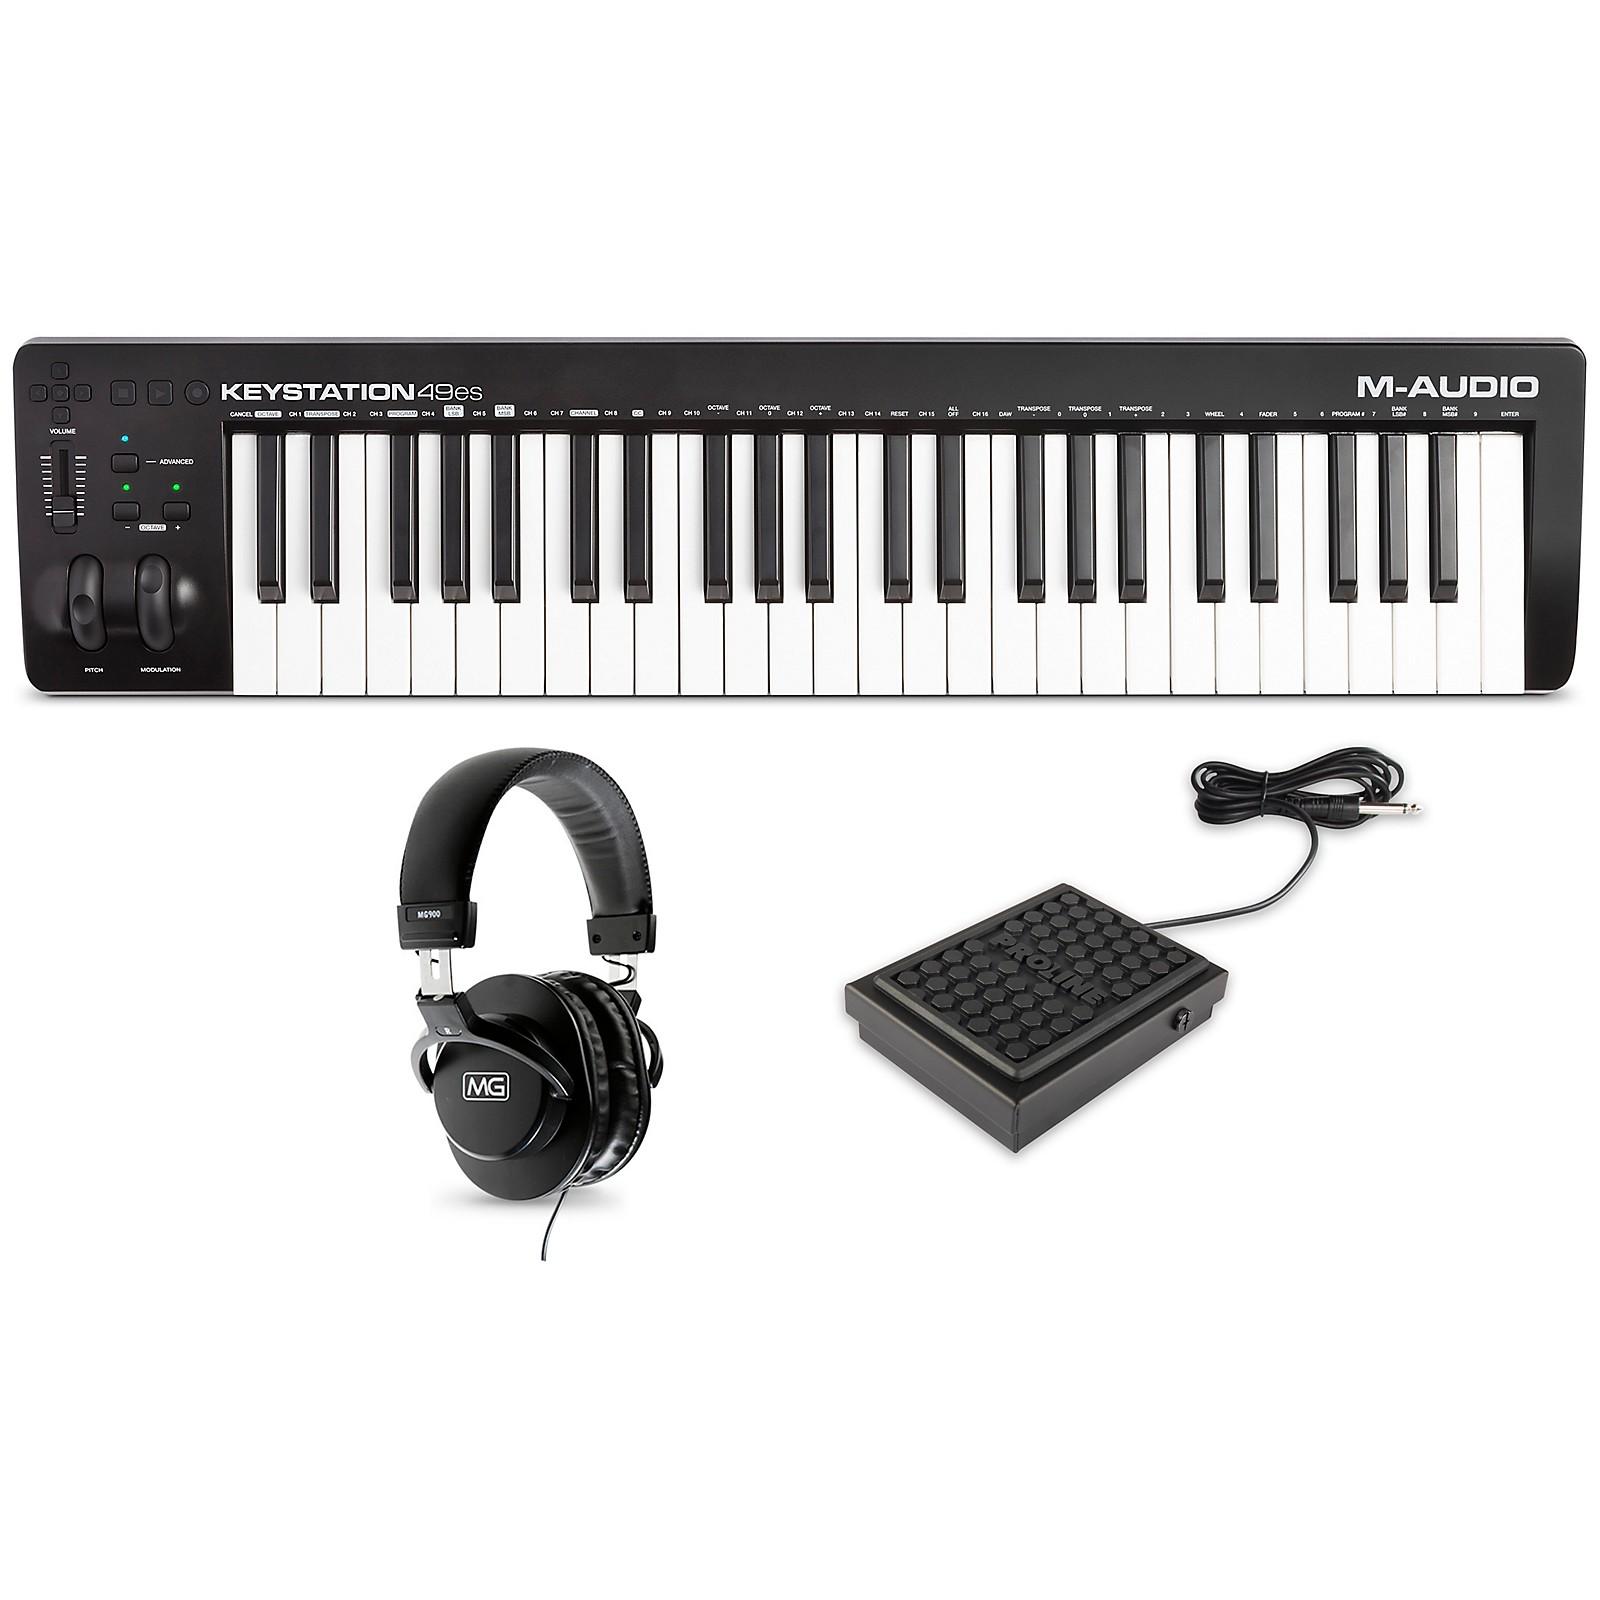 M-Audio Keystation 49es MK3 with Sustain Pedal and Headphones